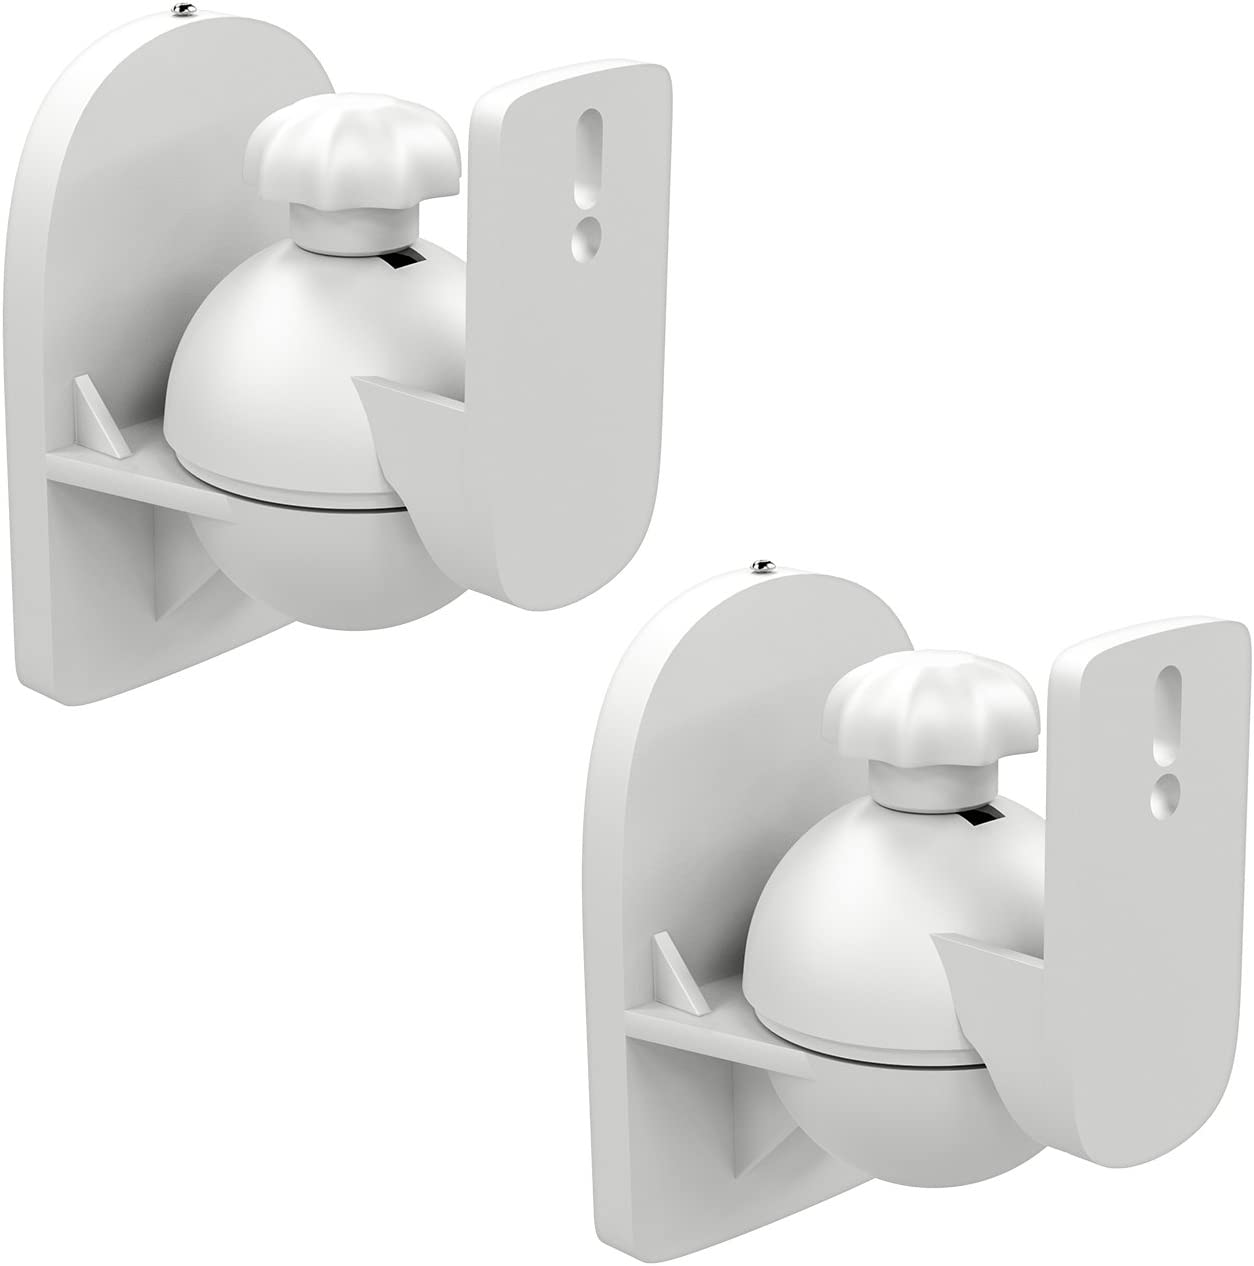 Deleycon 2x Universal Lautsprecher Wandhalterung Elektronik